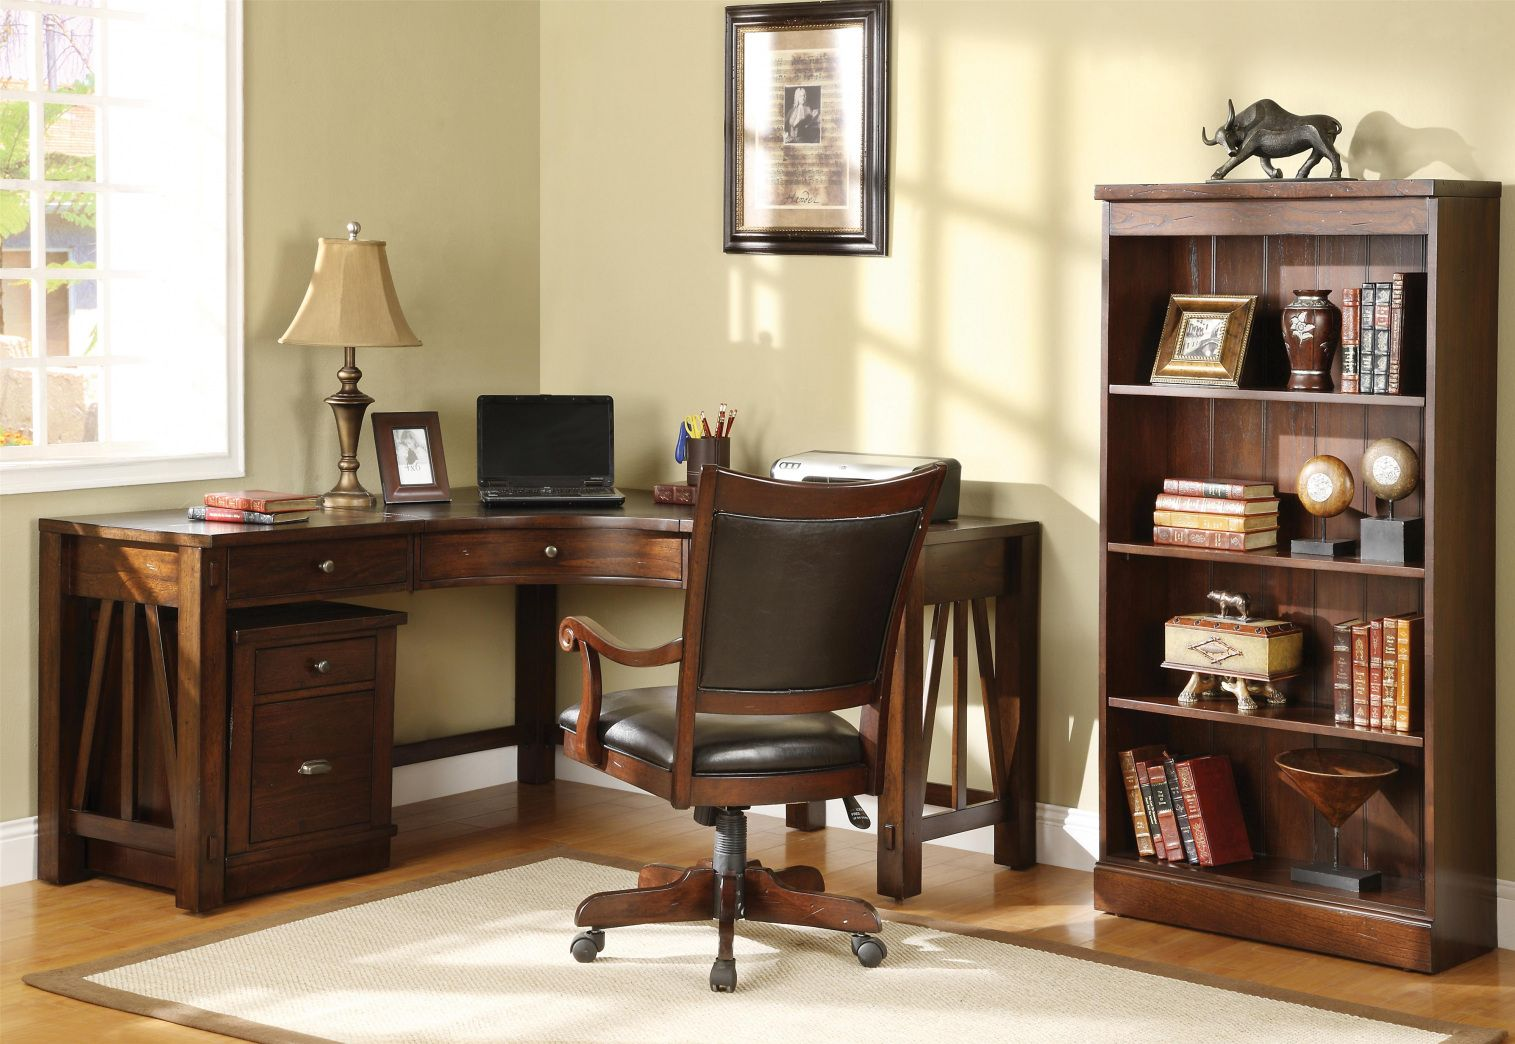 Oak Office Desks For Home Expensive Furniture Check More At Http Www Drjamesghoodblog